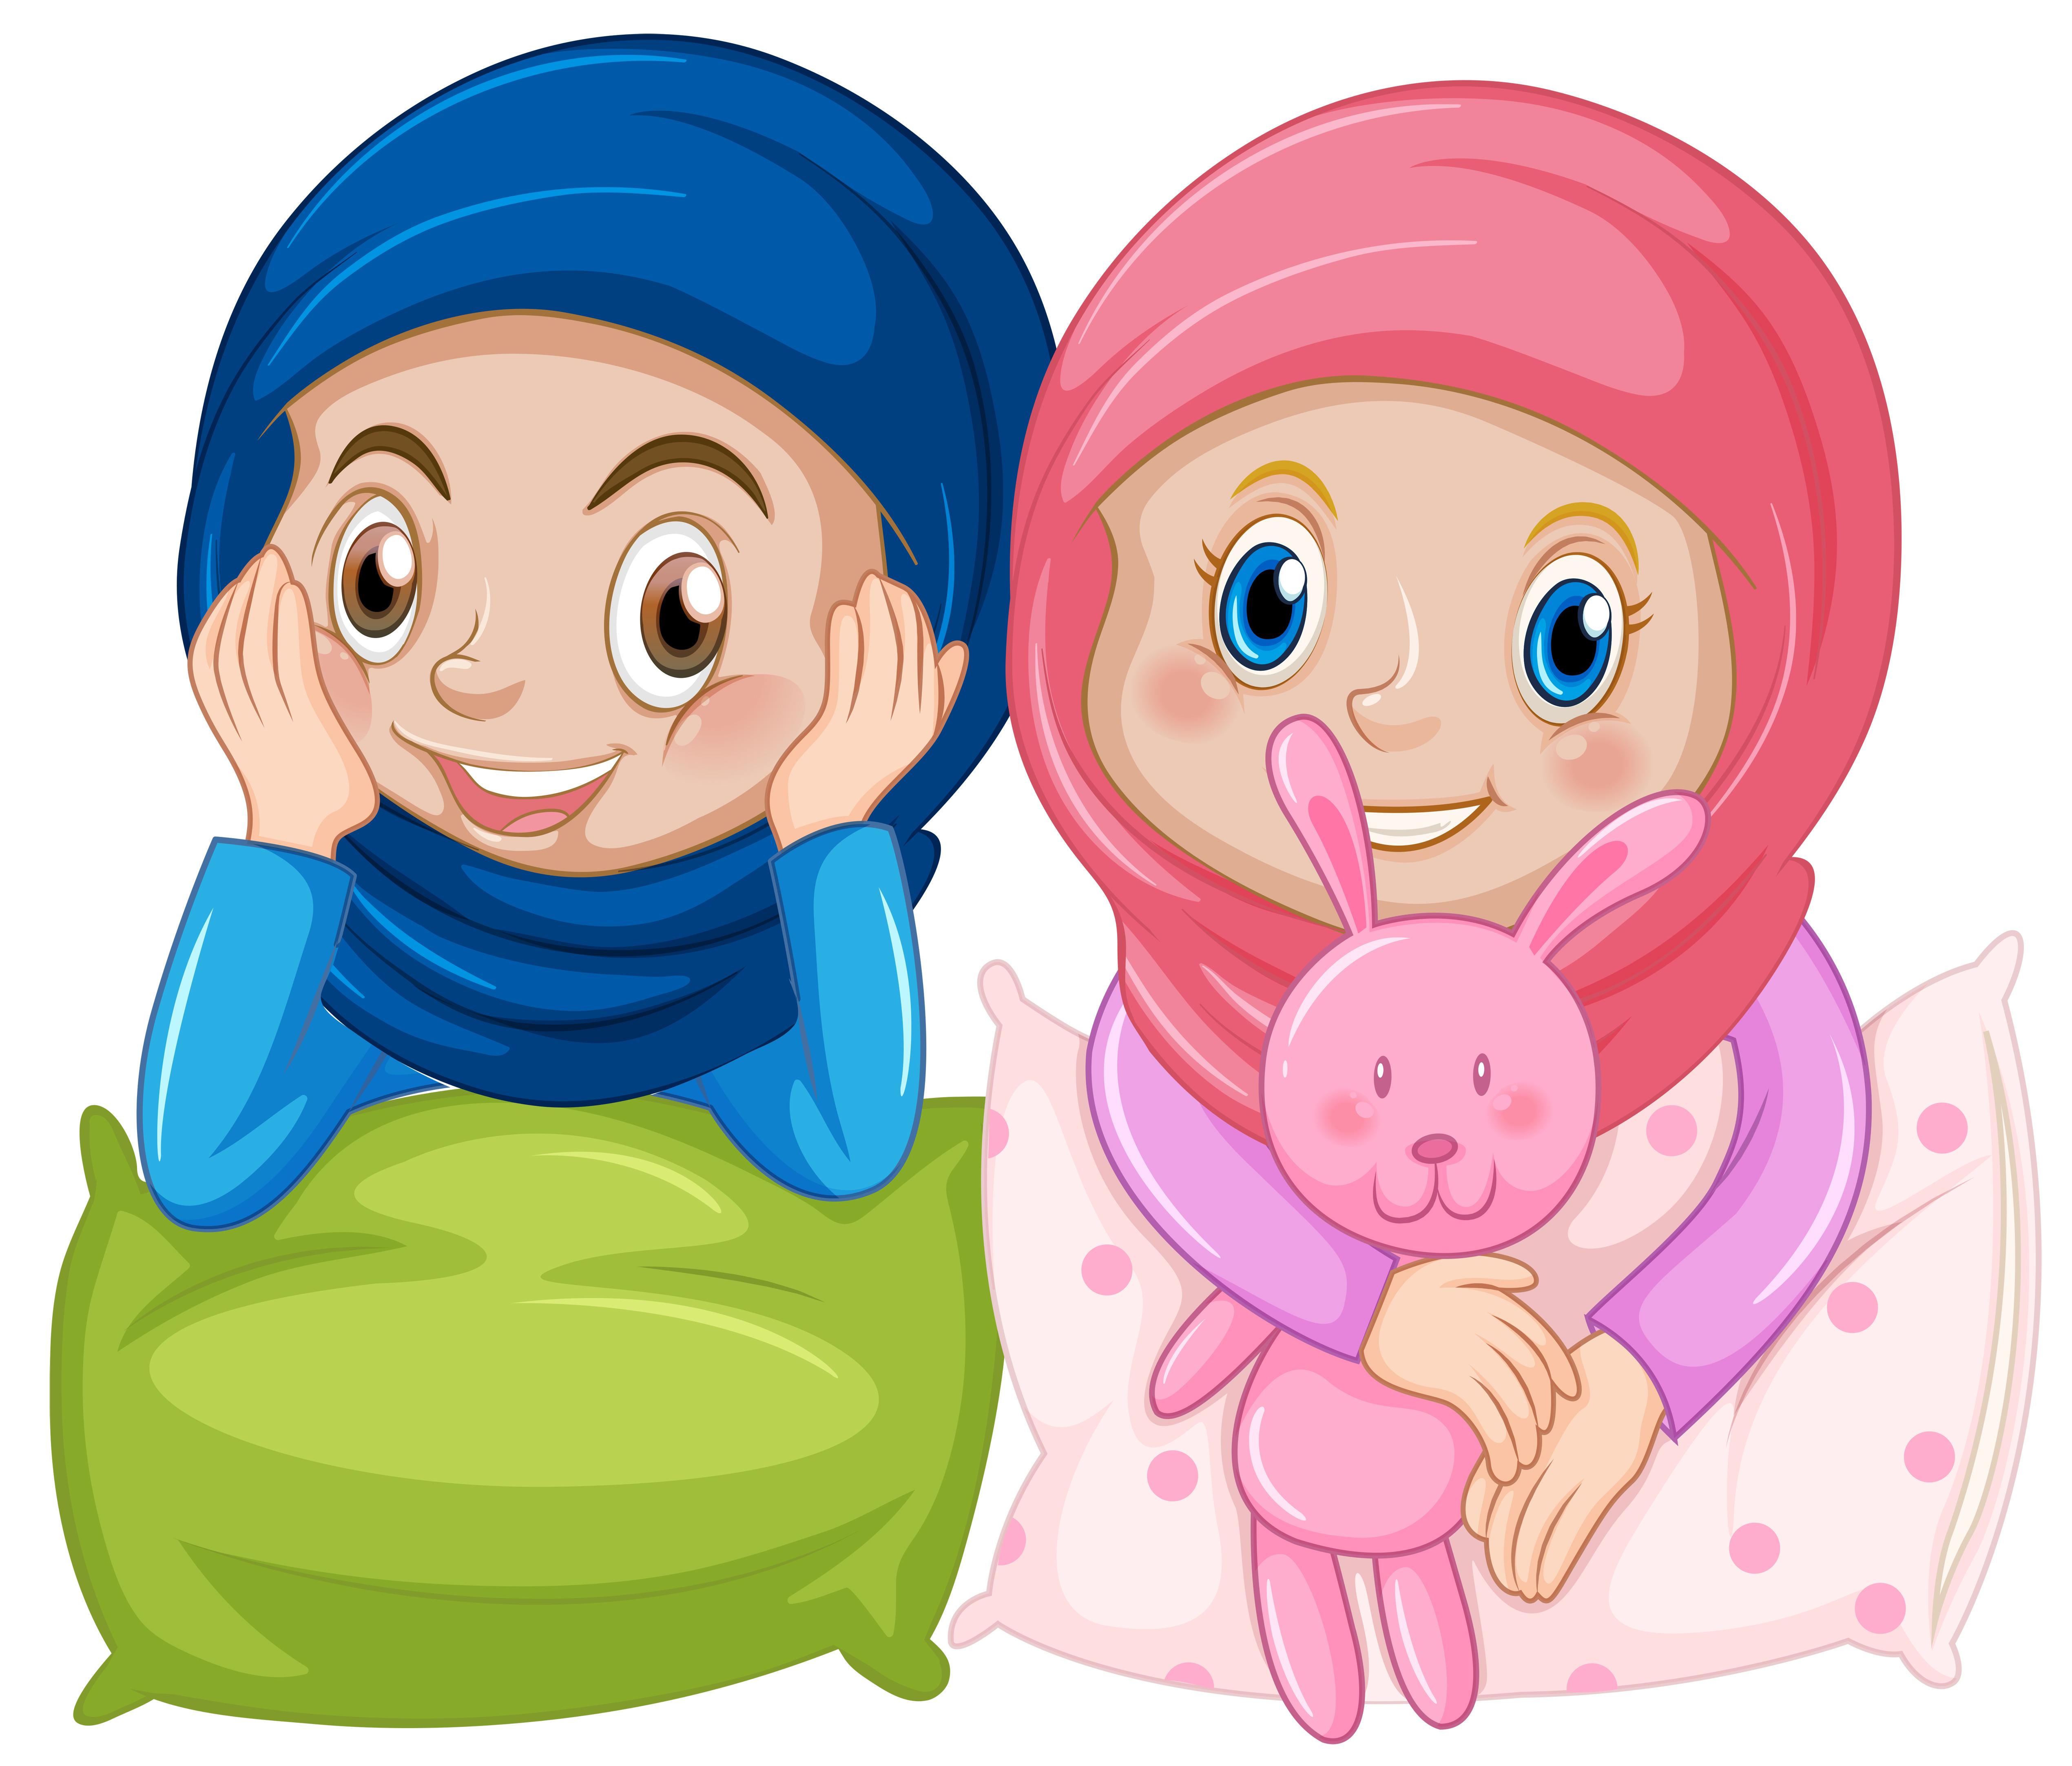 Muslim girl friend on white background - Download Free ...